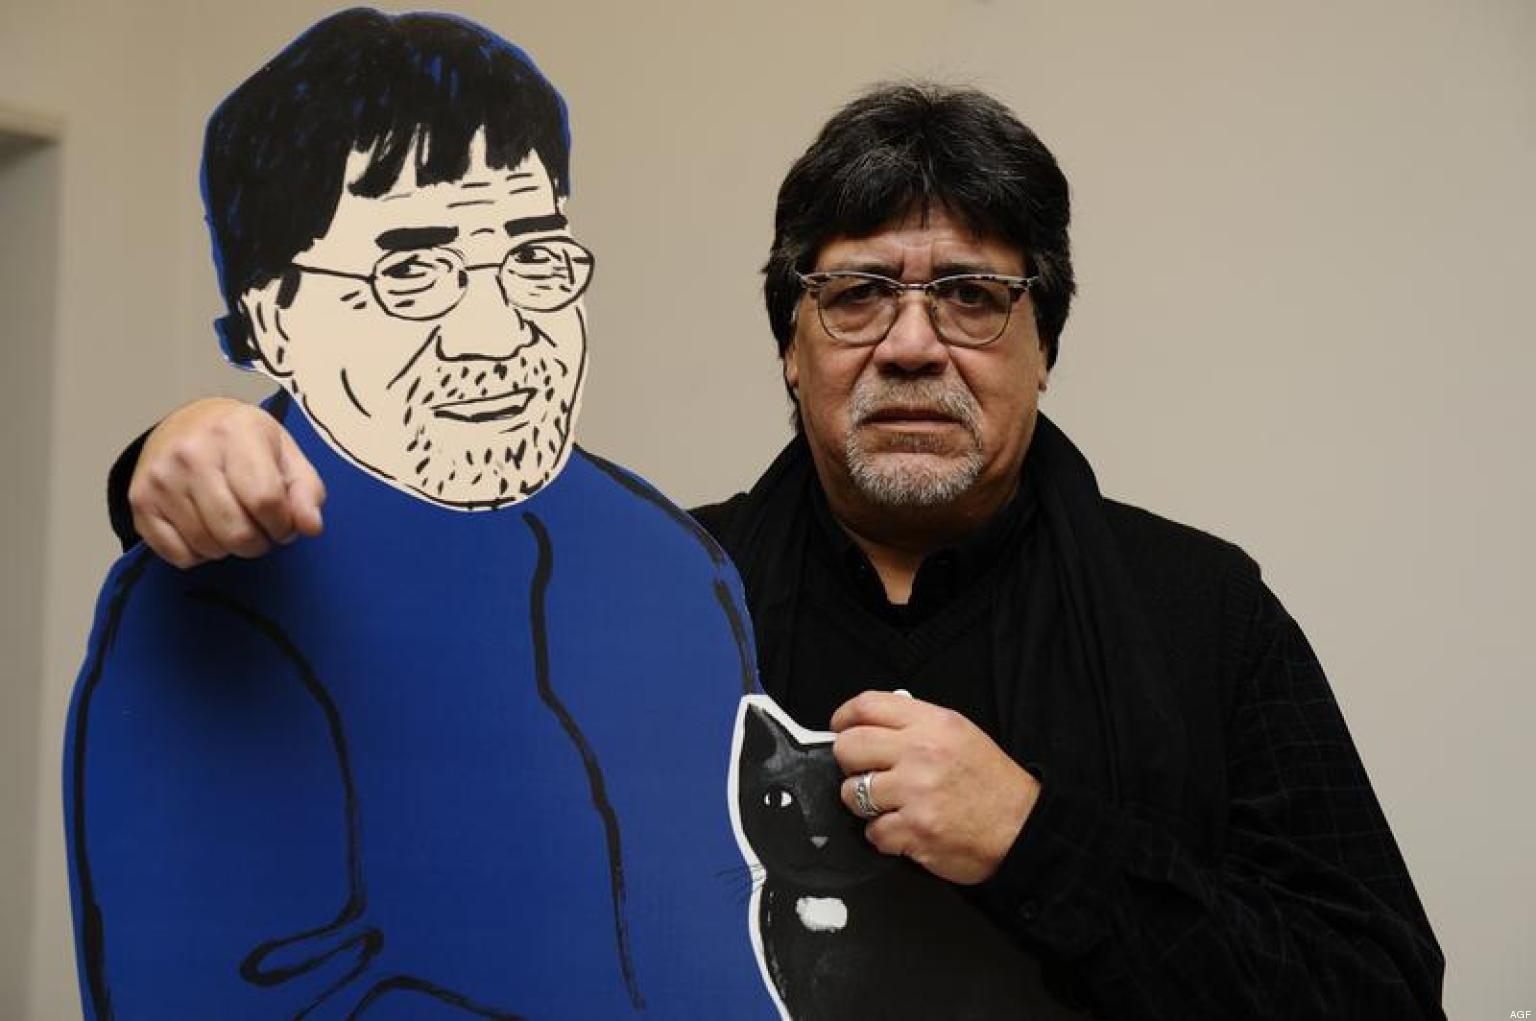 14/11/2012, Milano, lo scrittore Luis Sepulveda presenta il suo nuovo libro